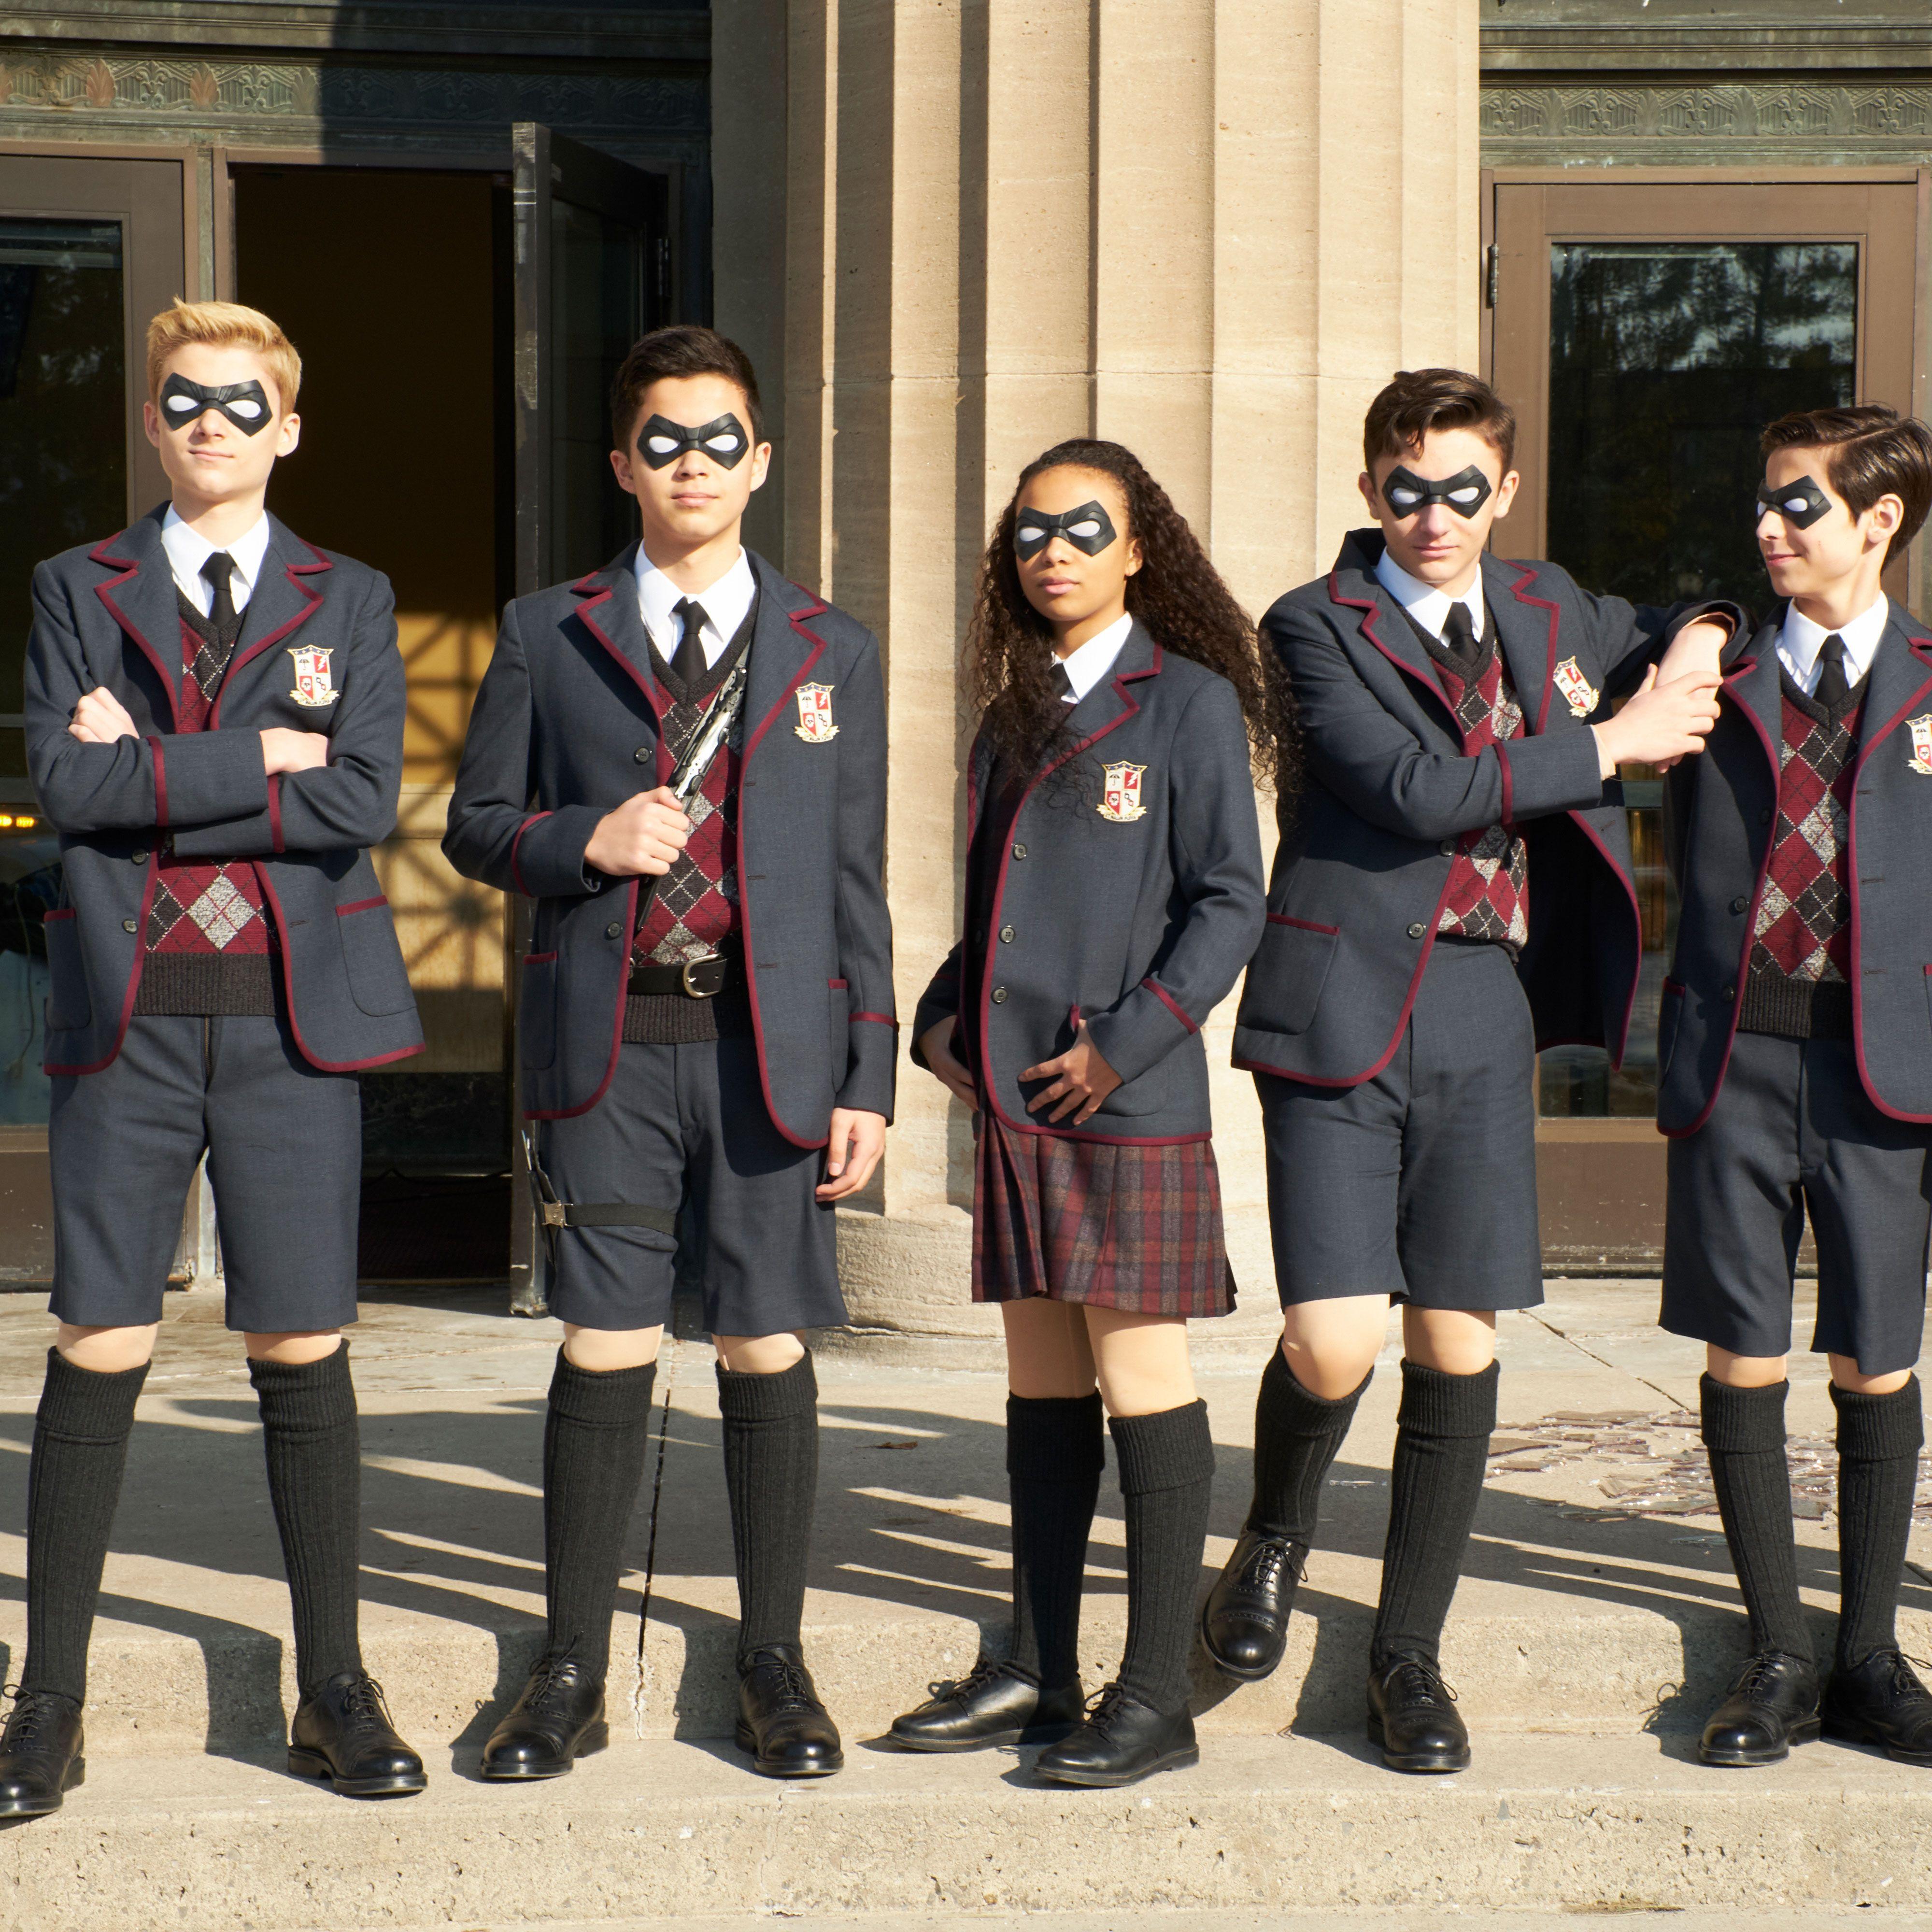 8 big questions The Umbrella Academy season 2 needs to answer